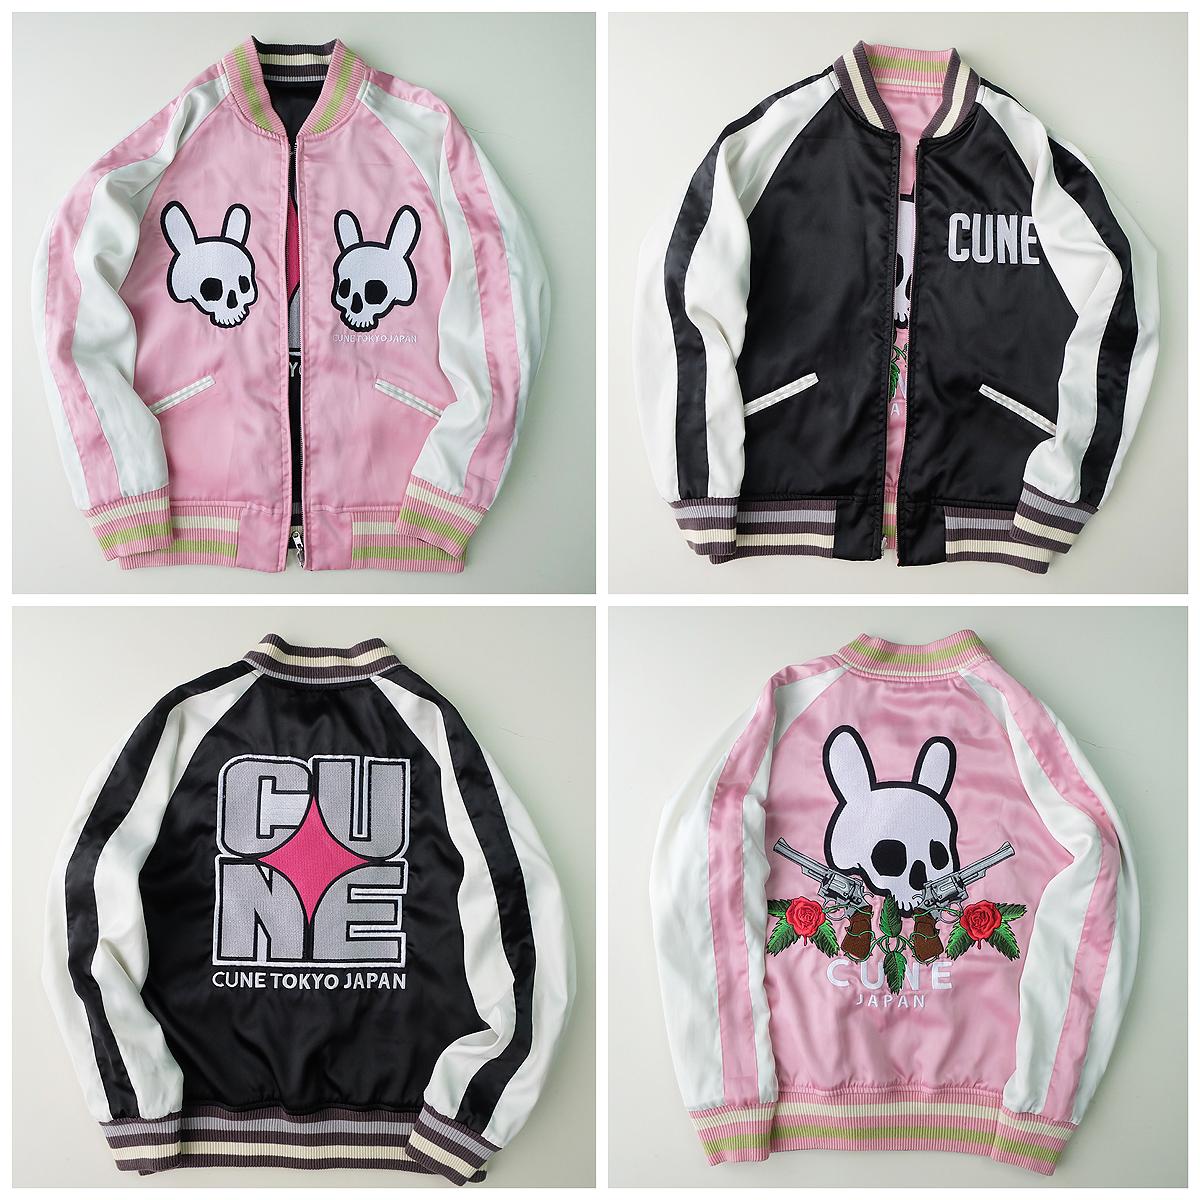 Leather jacket with roses - Japan Vintage Kawaii Cune Tokyo Japan Bunny Skull Black Pink Gun Roses Punk Sukajan Souvenir Jacket